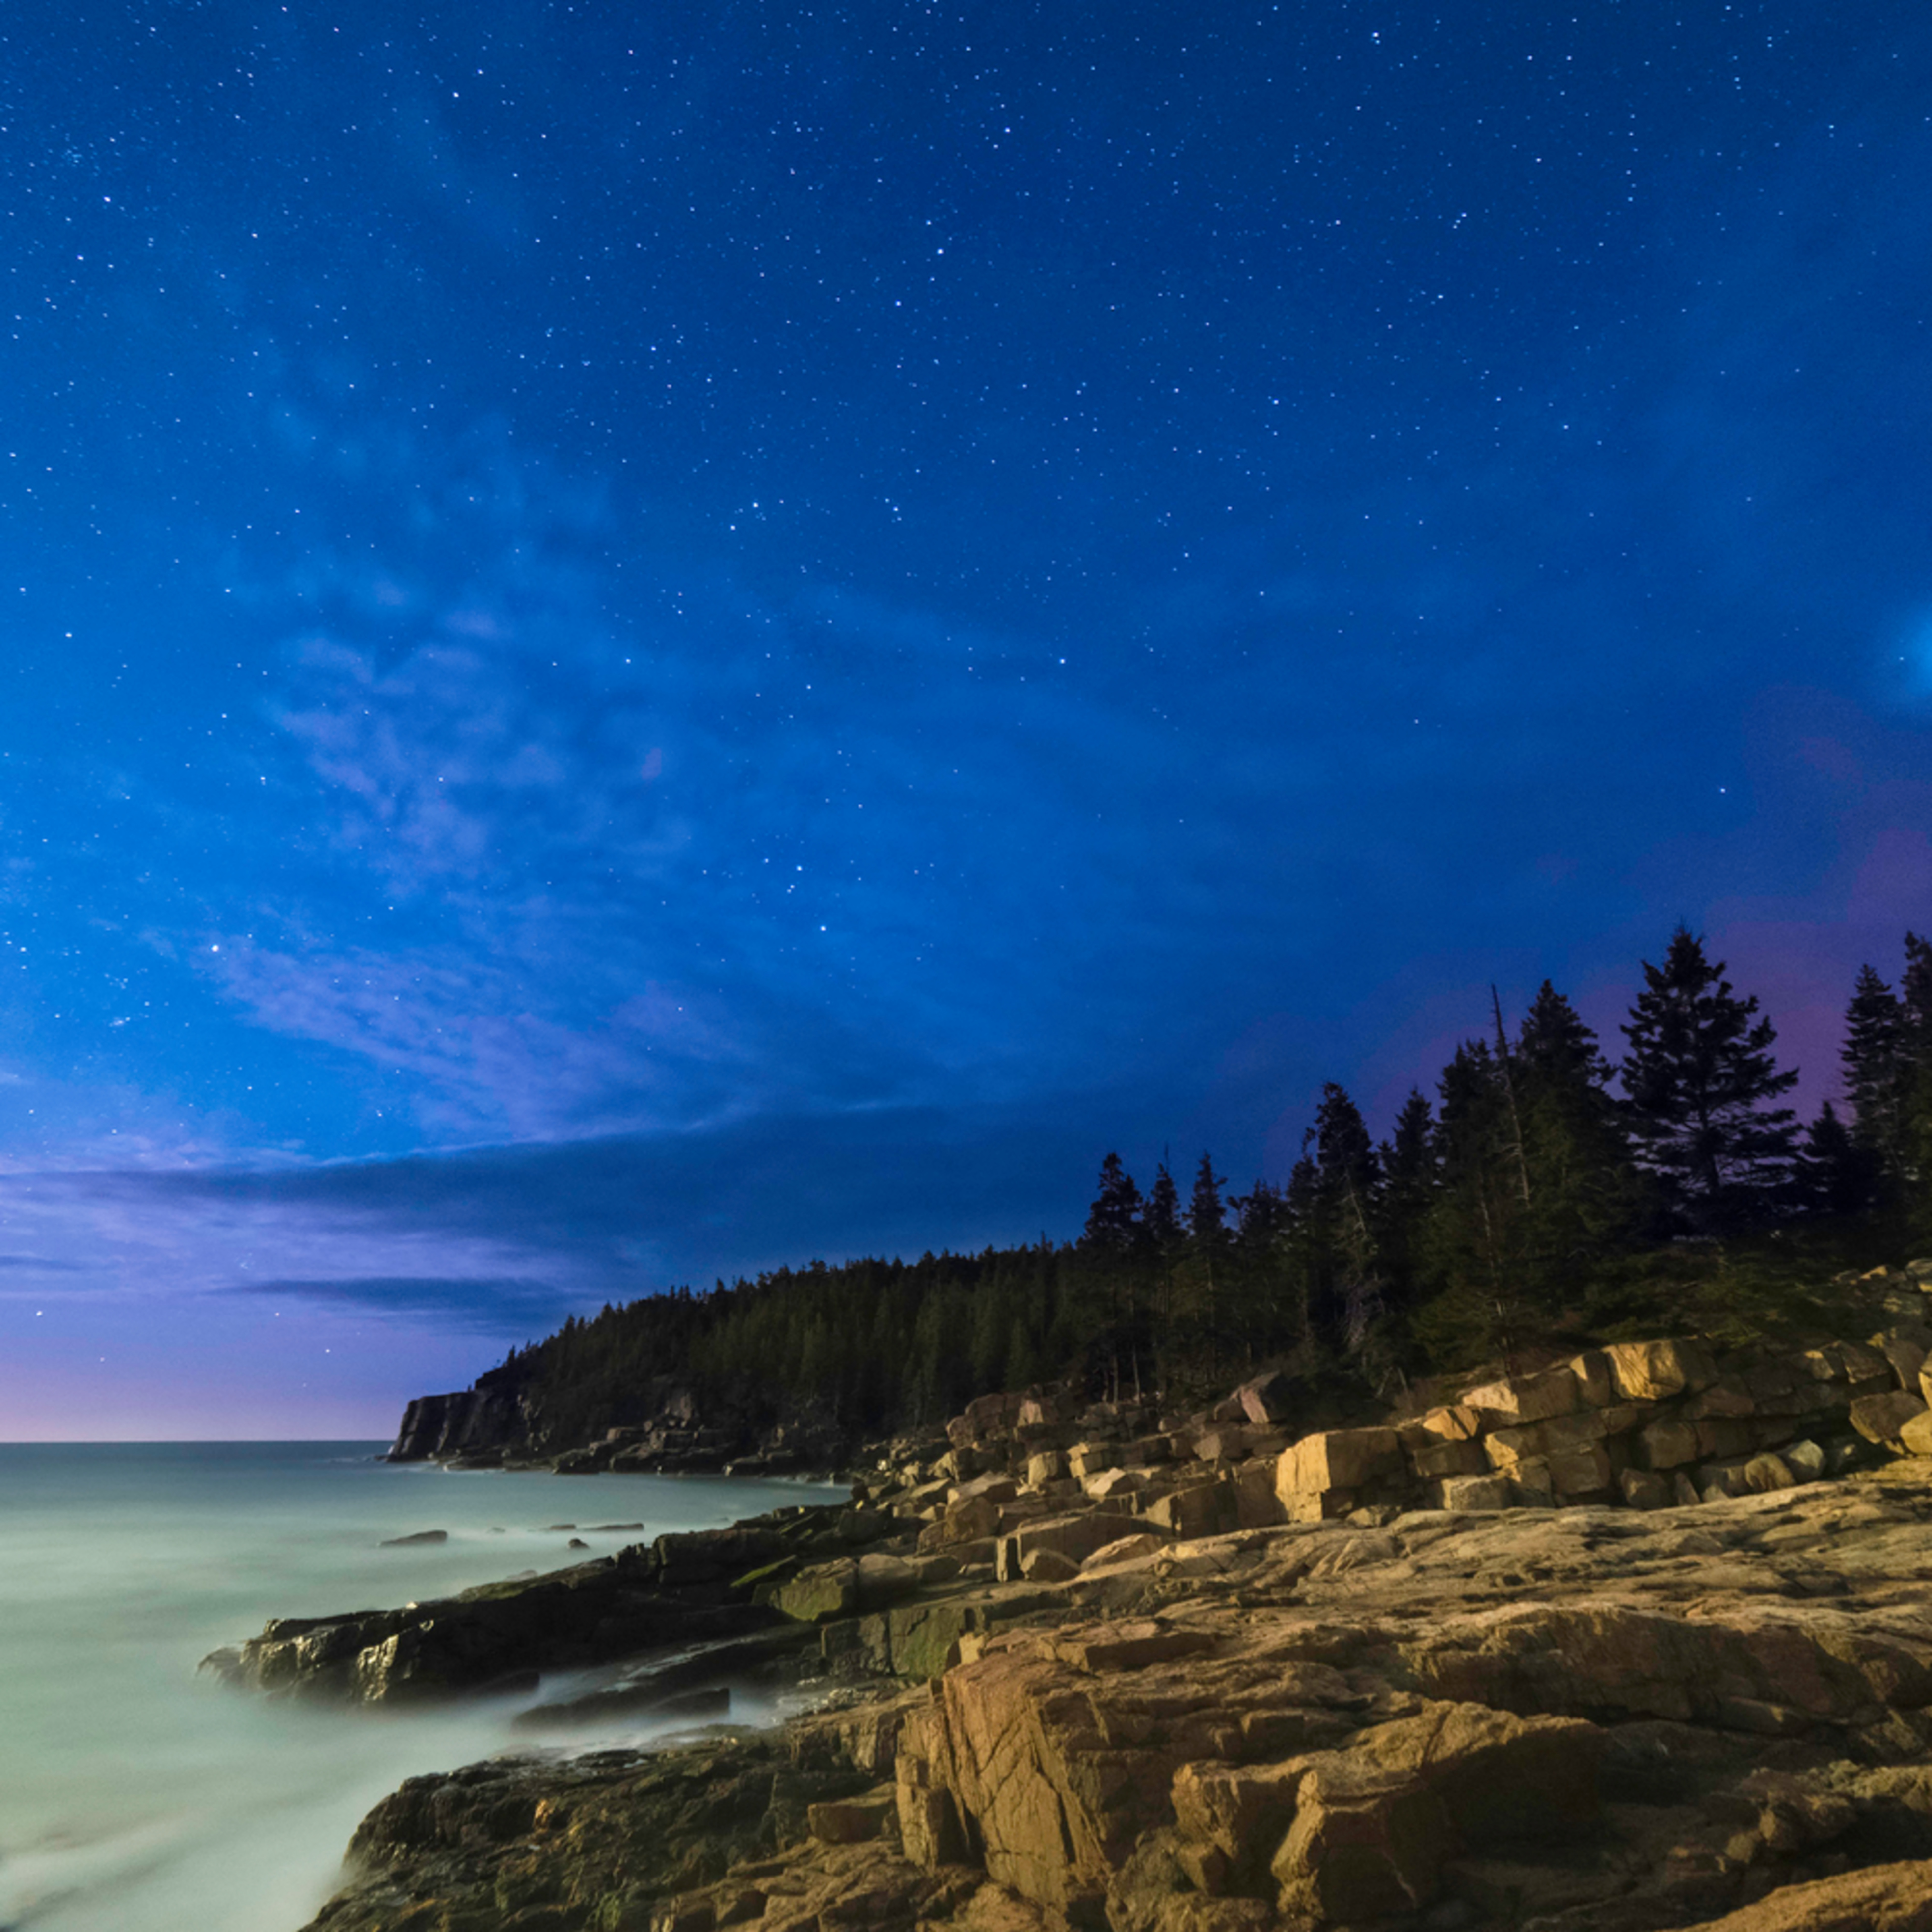 Otter cliff night sky pa0n83